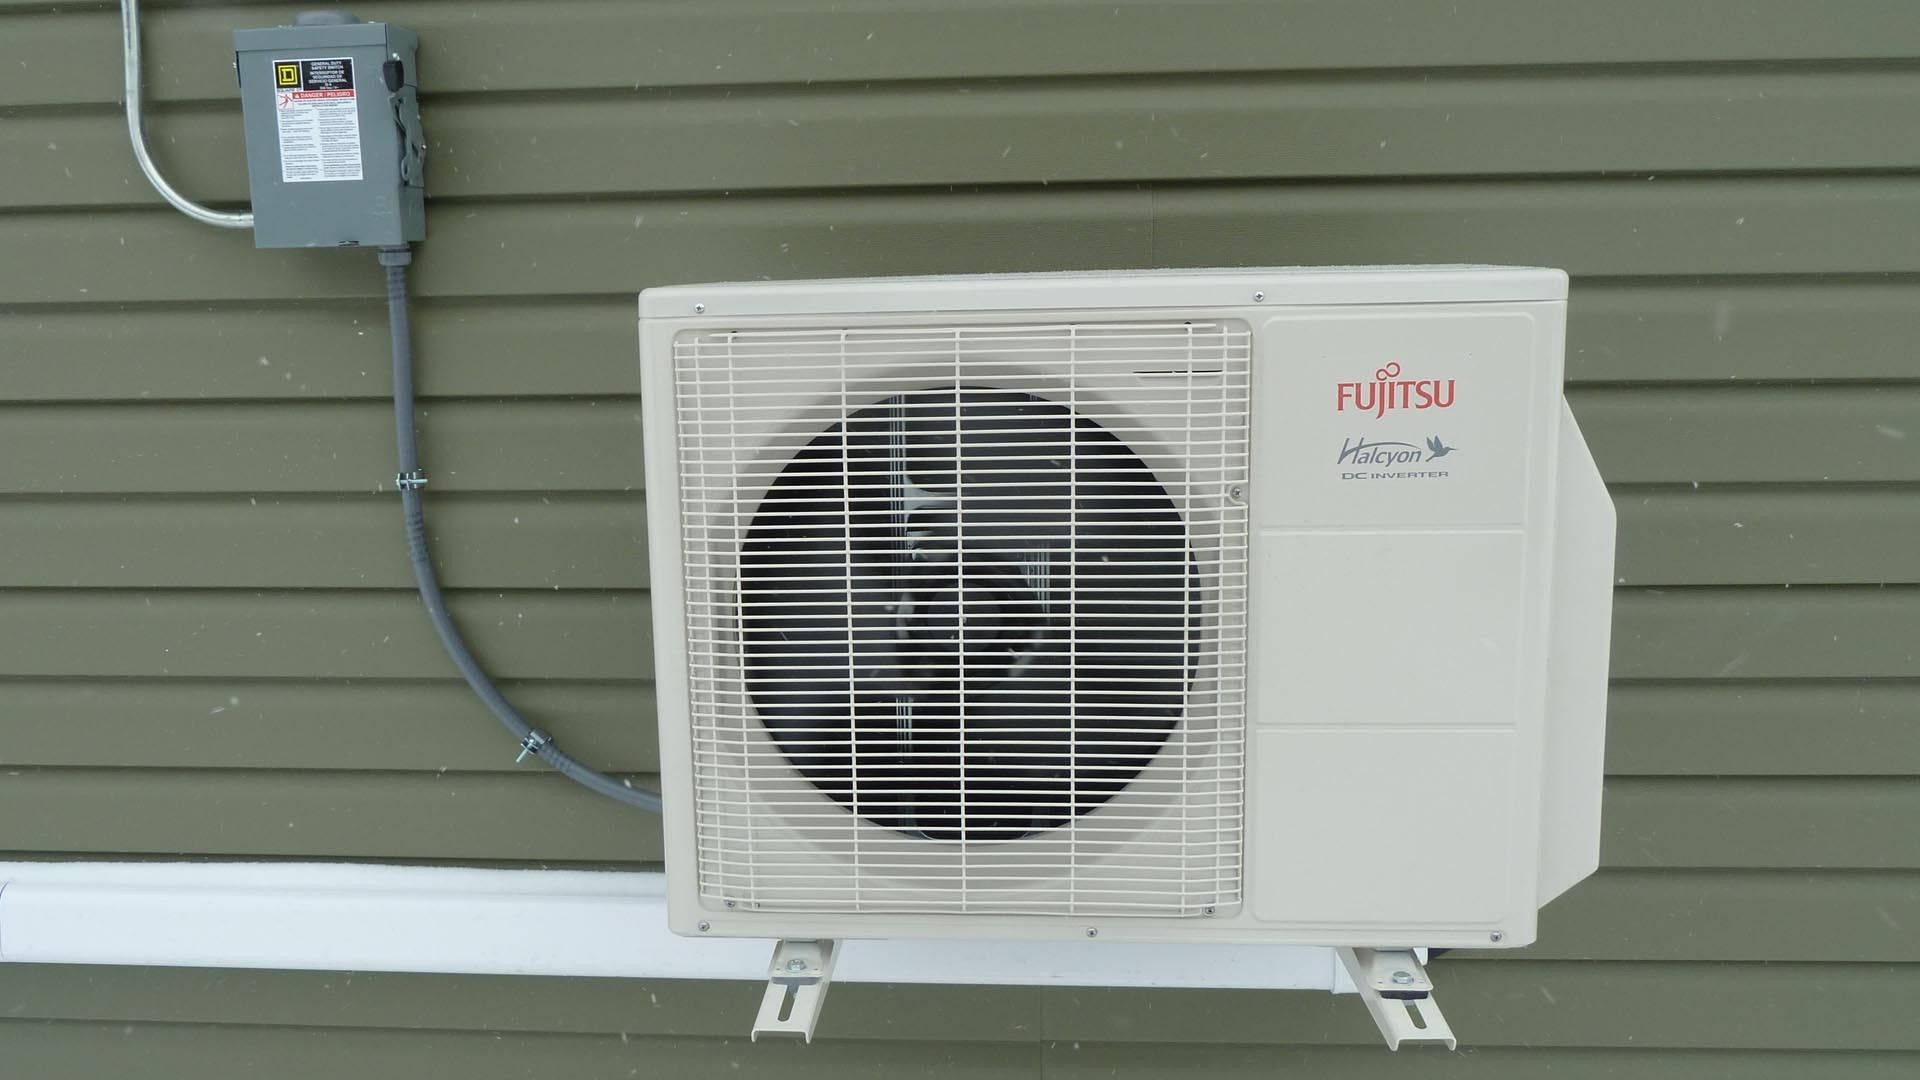 unique wiring diagram ac split mitsubishi #diagram #diagramtemplate  #diagramsample | refrigeration and air conditioning, split ac, split system  heat pump  pinterest